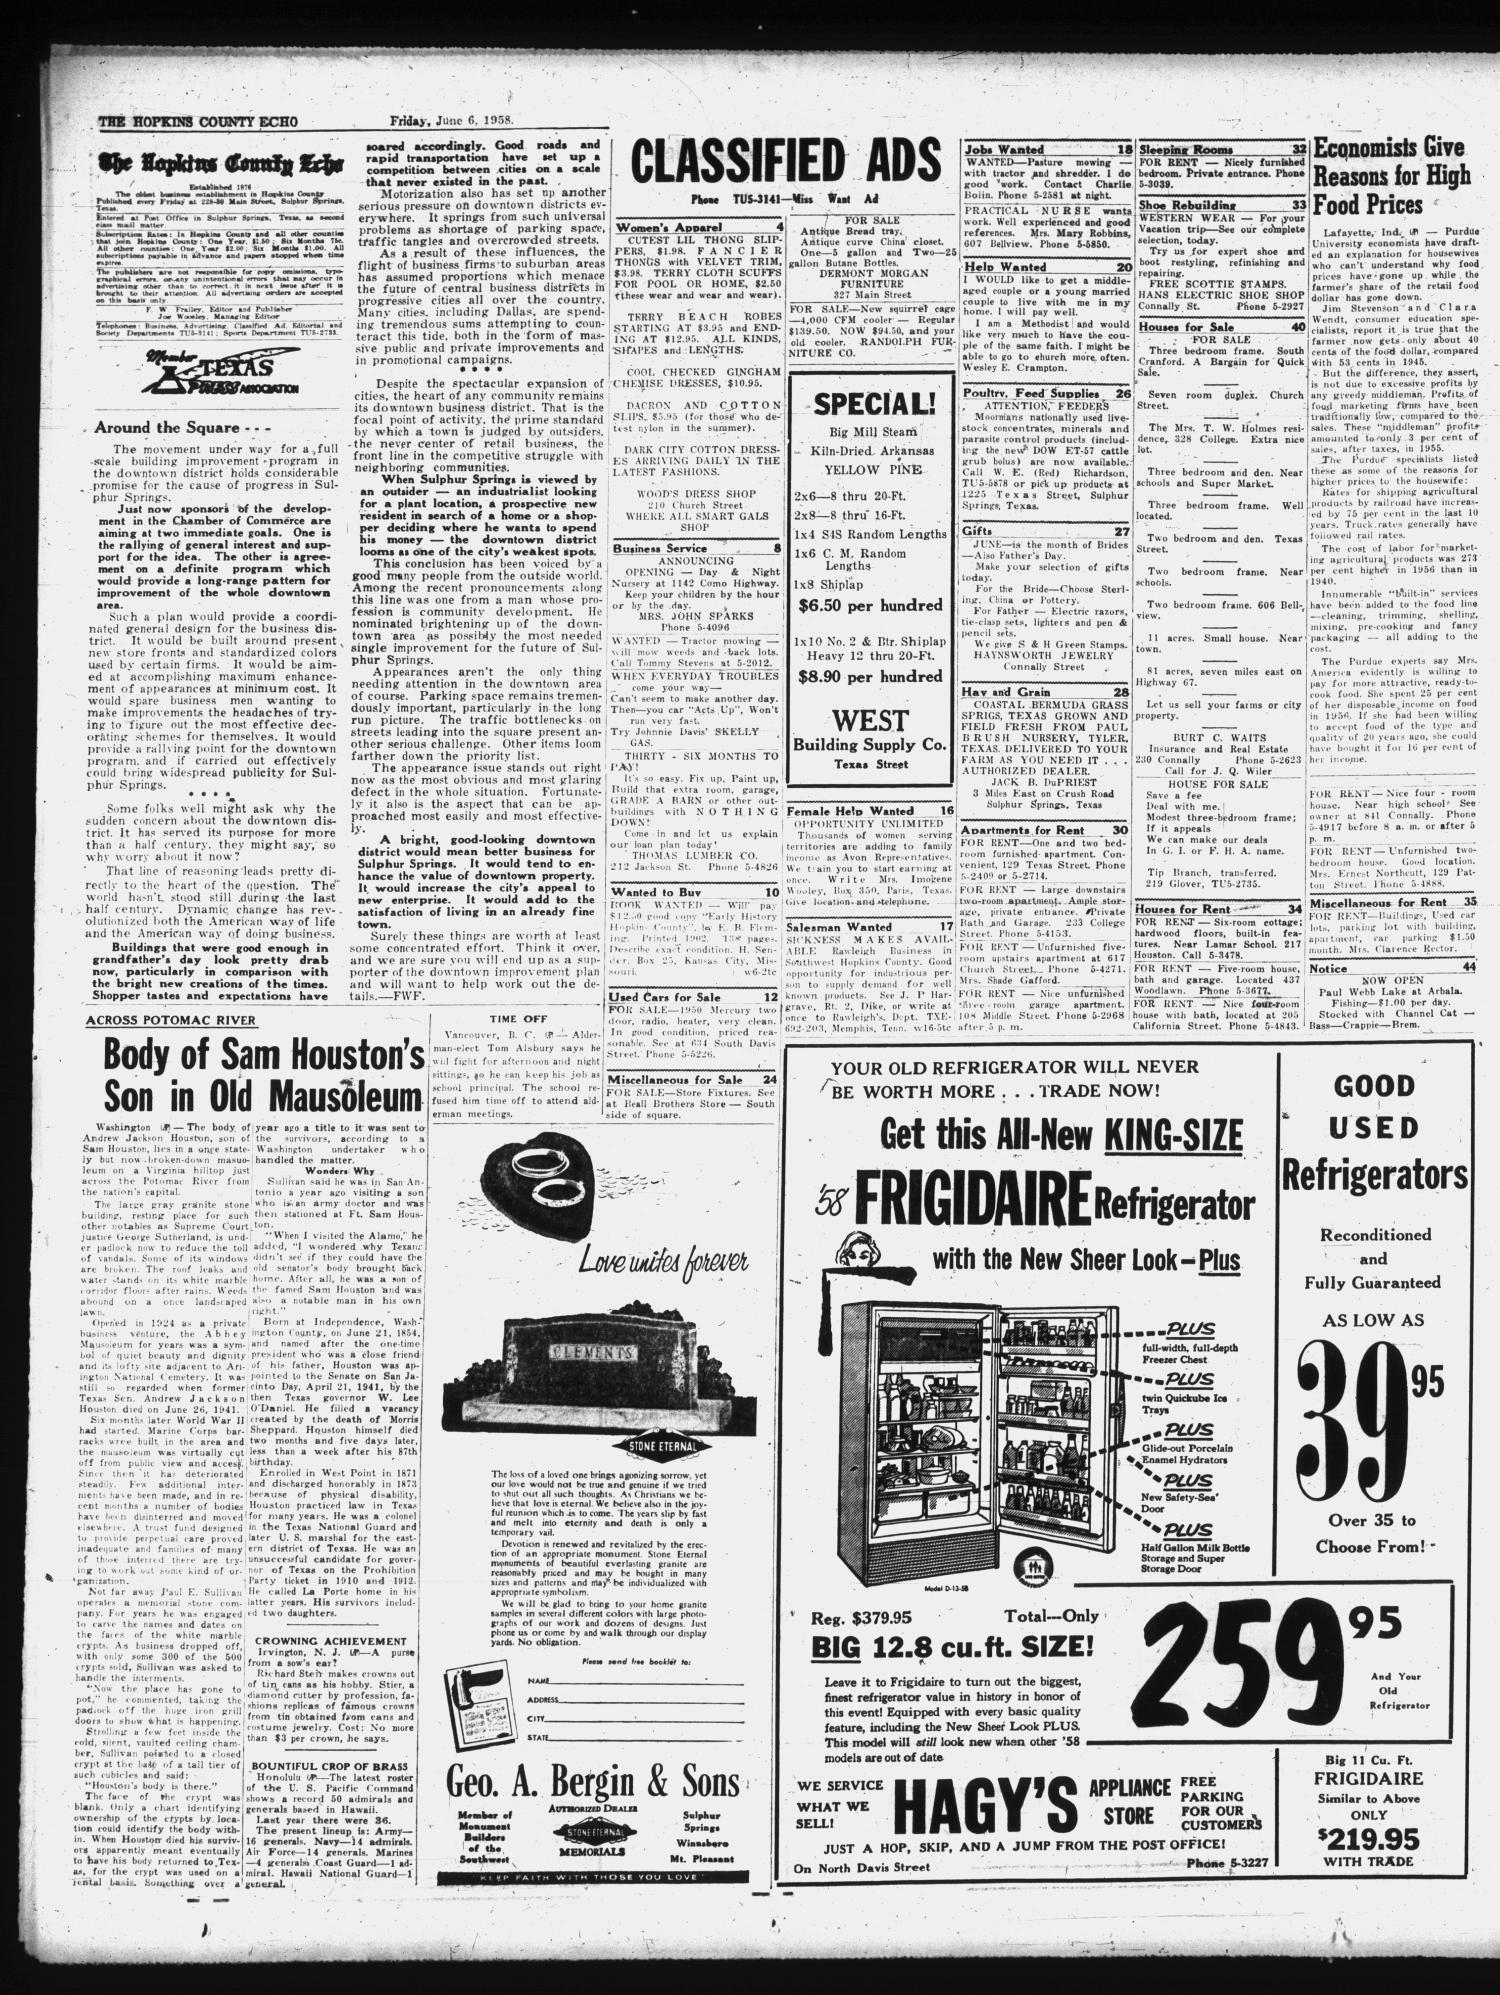 The Hopkins County Echo (Sulphur Springs, Tex.), Vol. 83, No. 23, Ed. 1 Friday, June 6, 1958